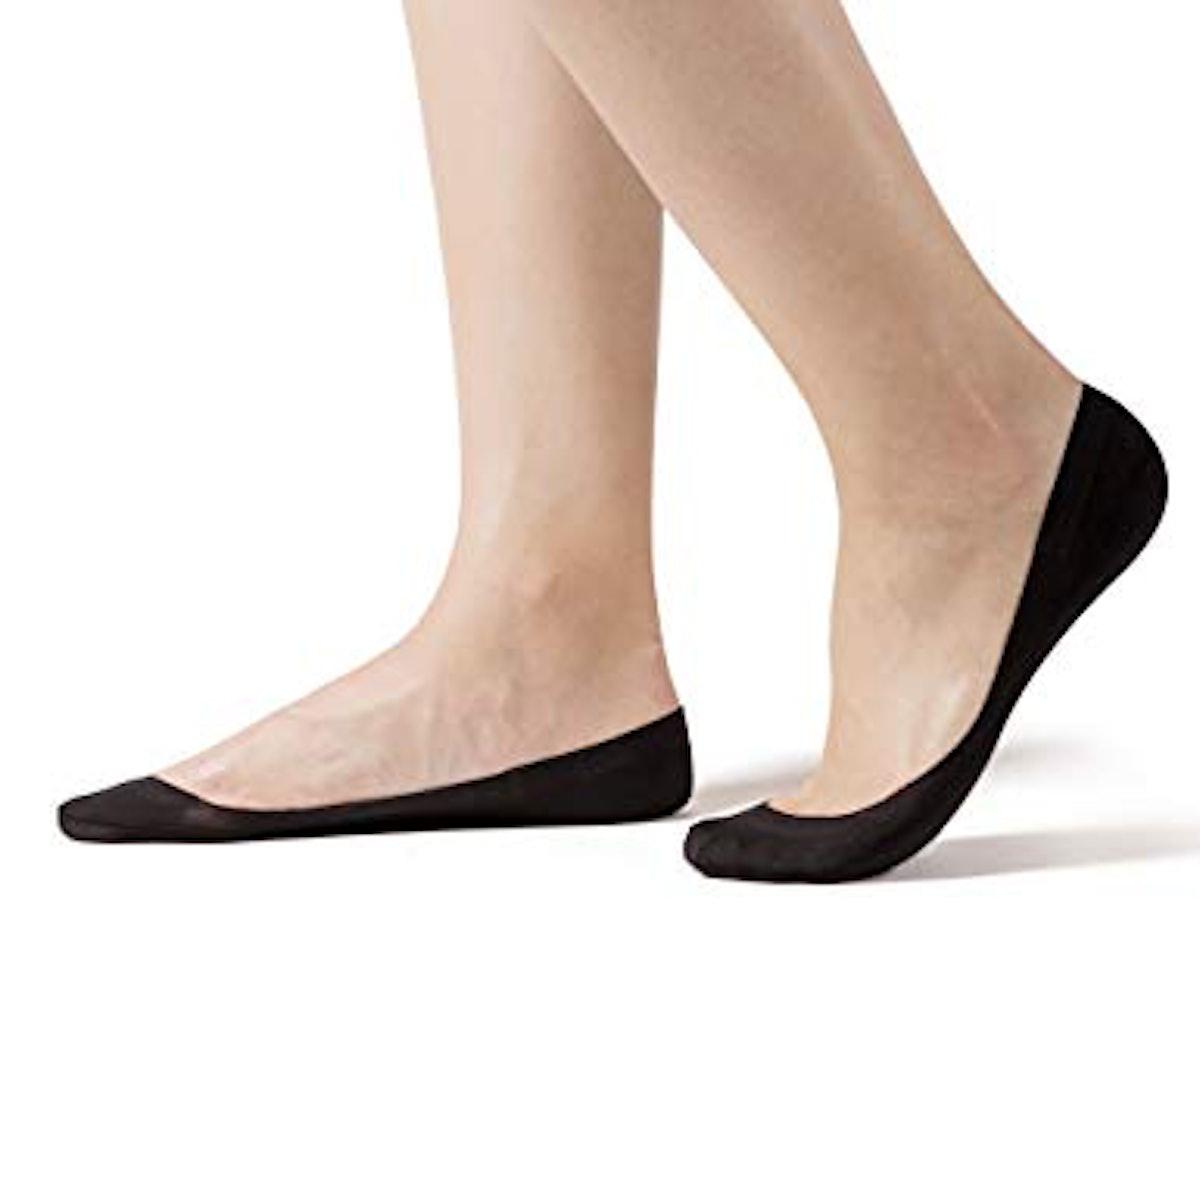 SHECC SoleHugger Secret No Show Women's Sock, 4 Pack